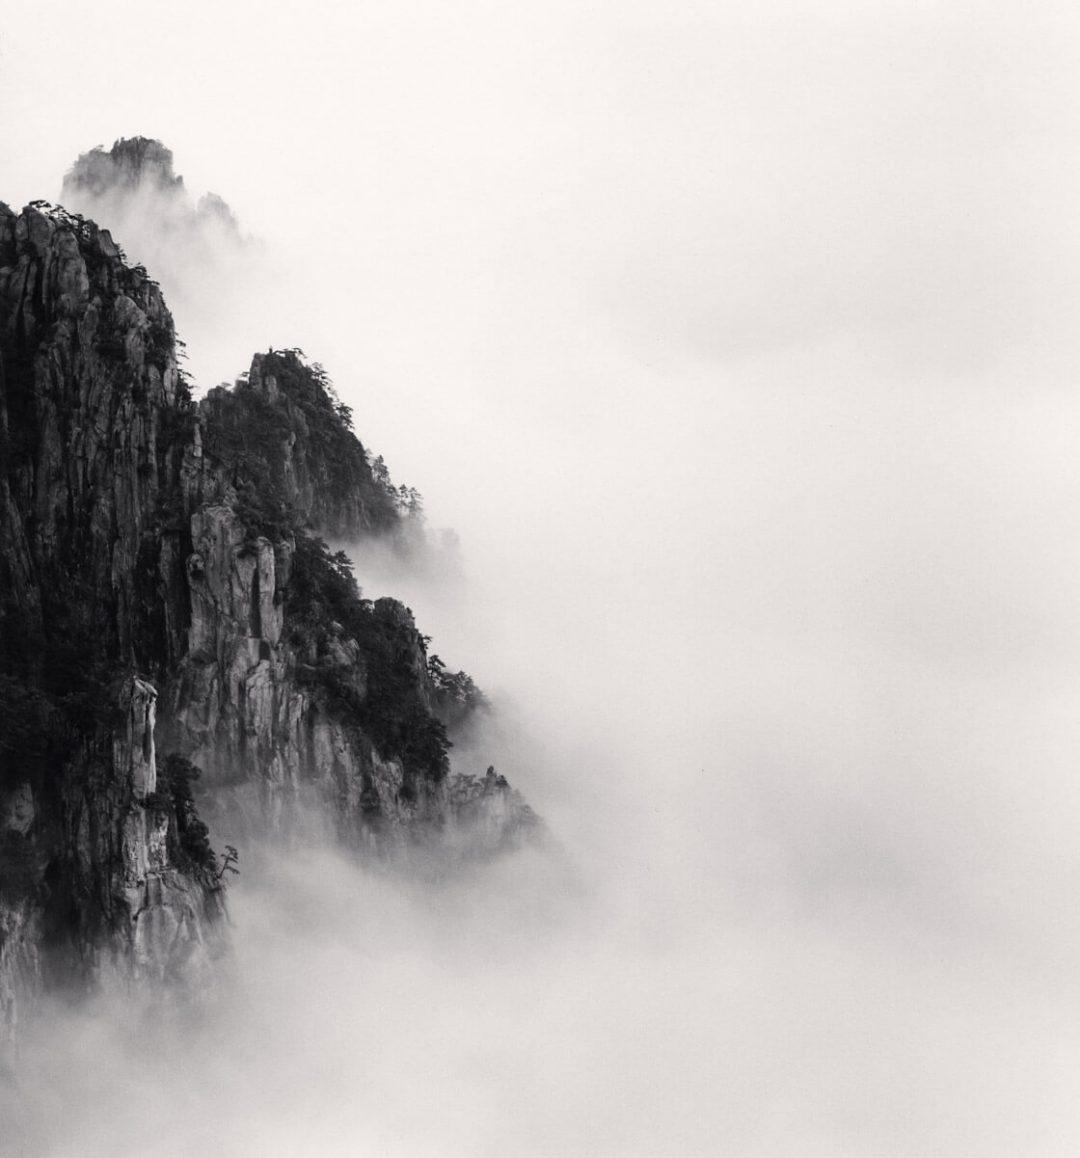 Huangshan Mountains, Study 6, Anhui, China - Michael Kenna